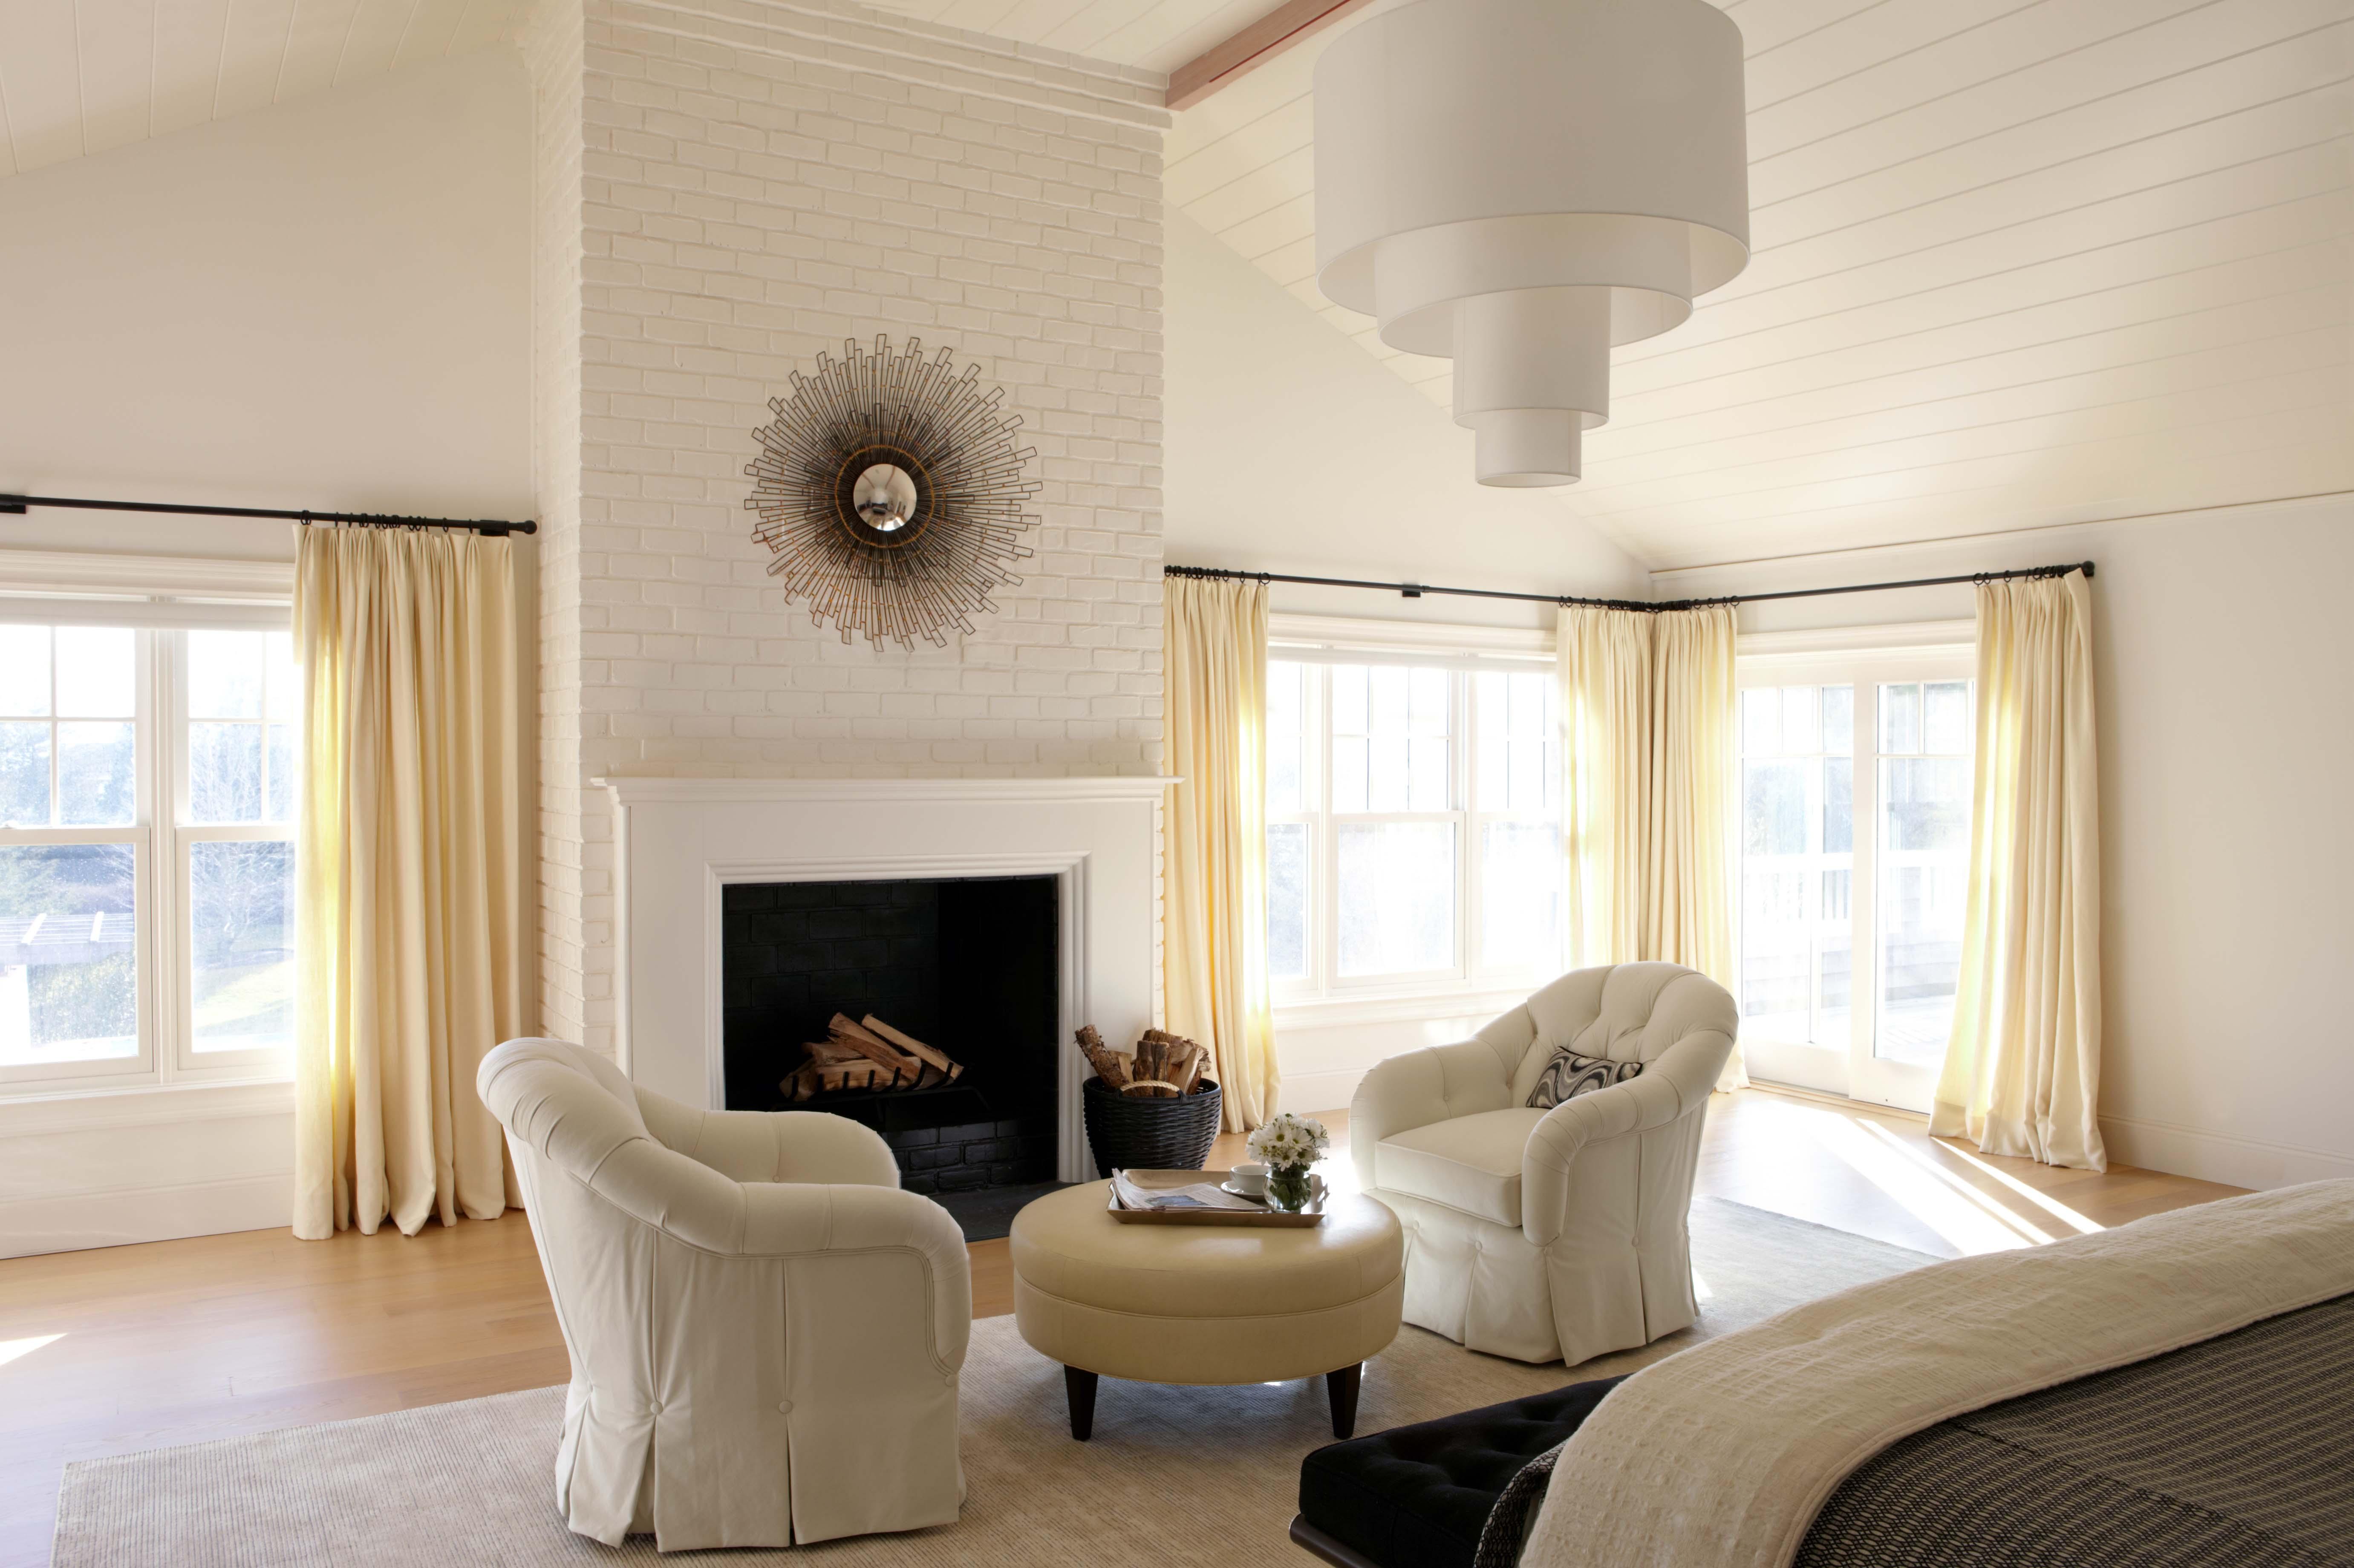 Jody sokol design long island interior designer and renovation - Interior designs of li ...